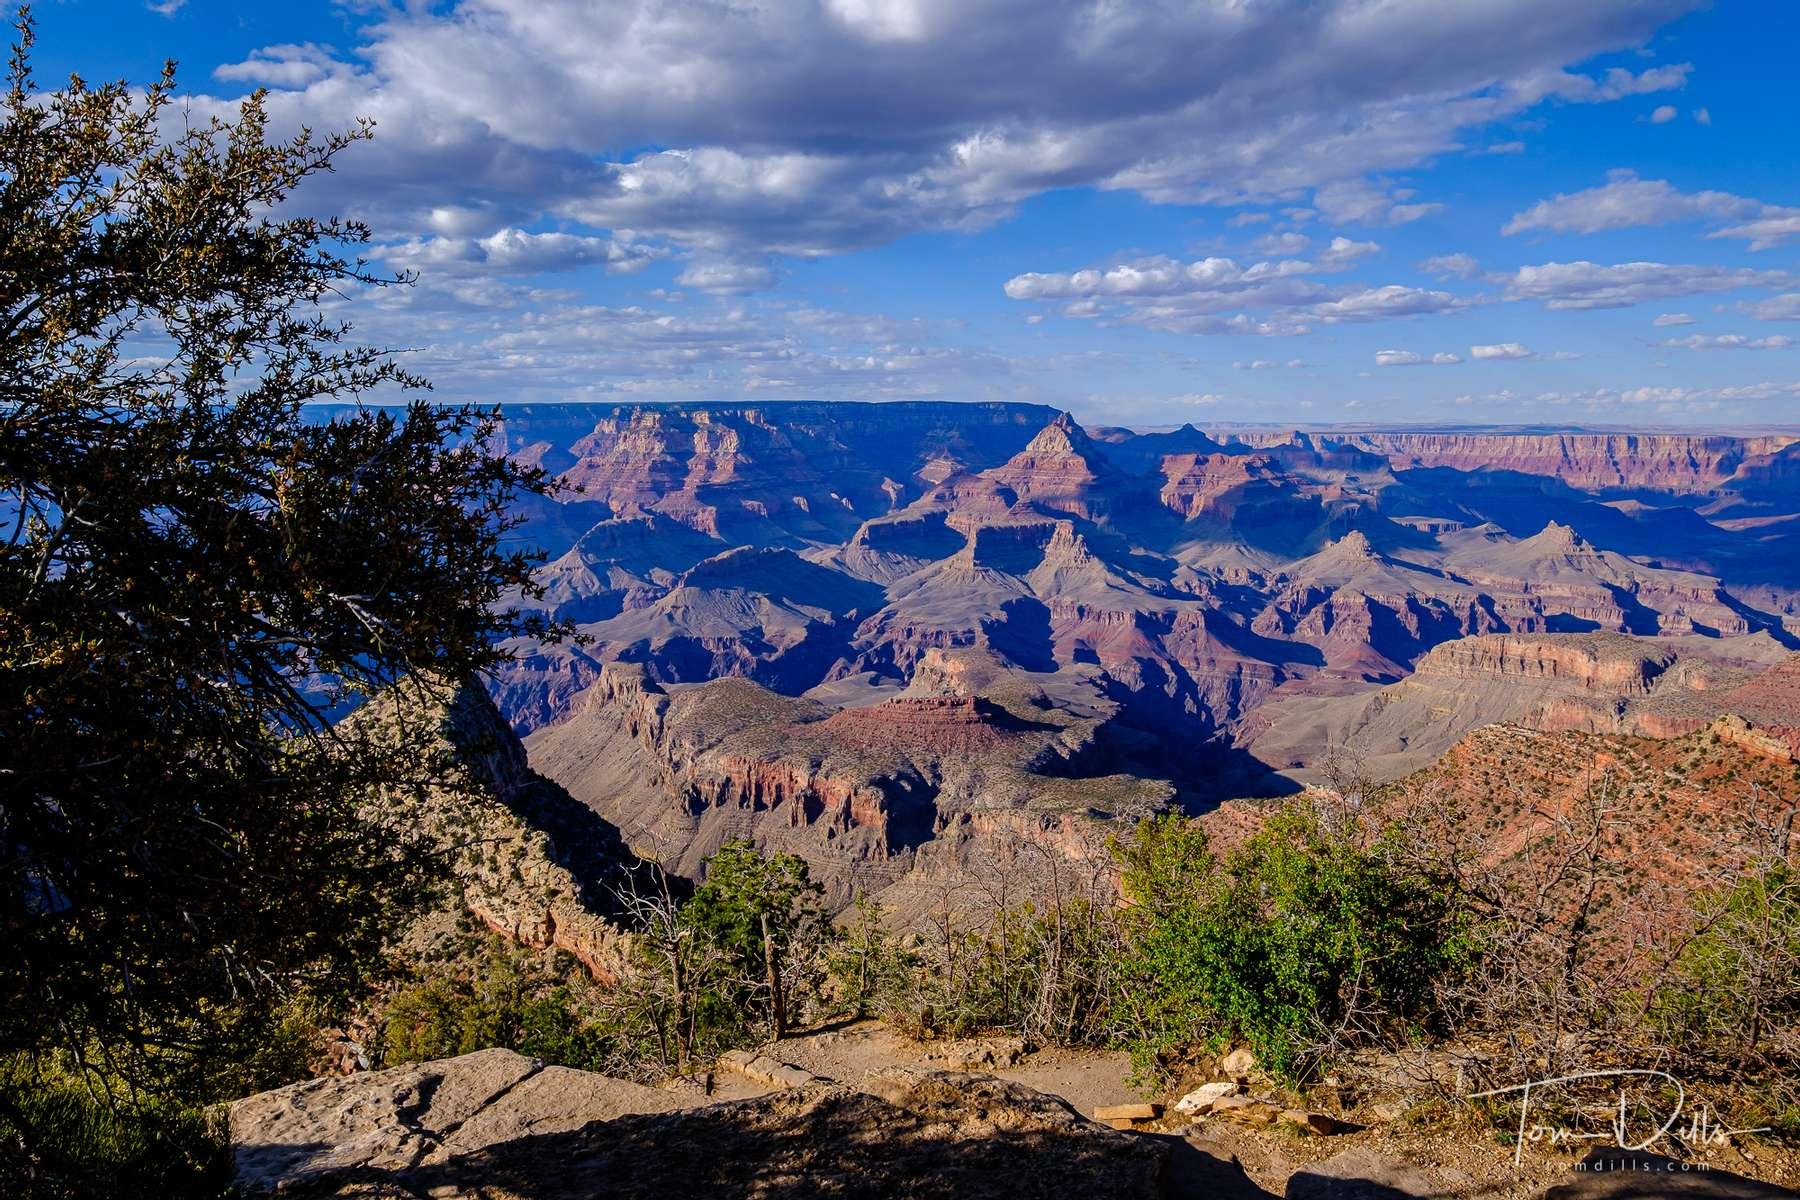 Desert View Watchtower area of Grand Canyon National Park, Arizona